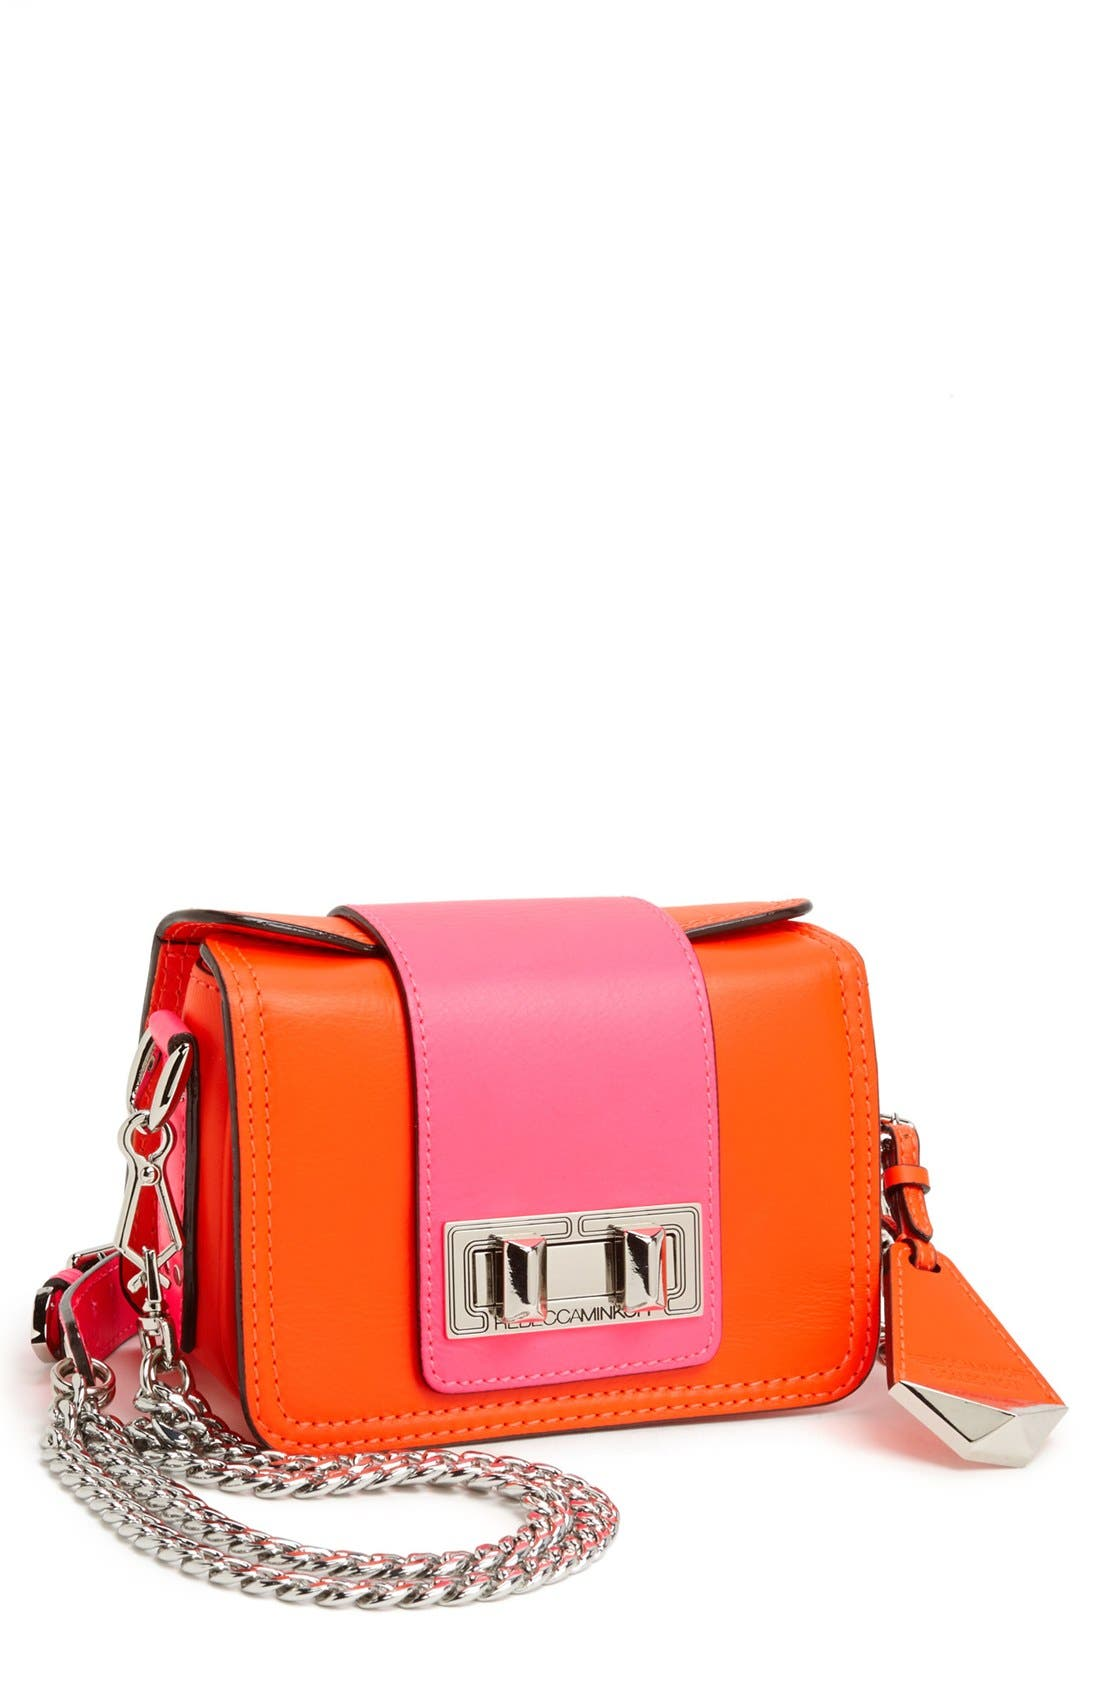 Alternate Image 1 Selected - Rebecca Minkoff 'Sammy - Mini' Crossbody Bag